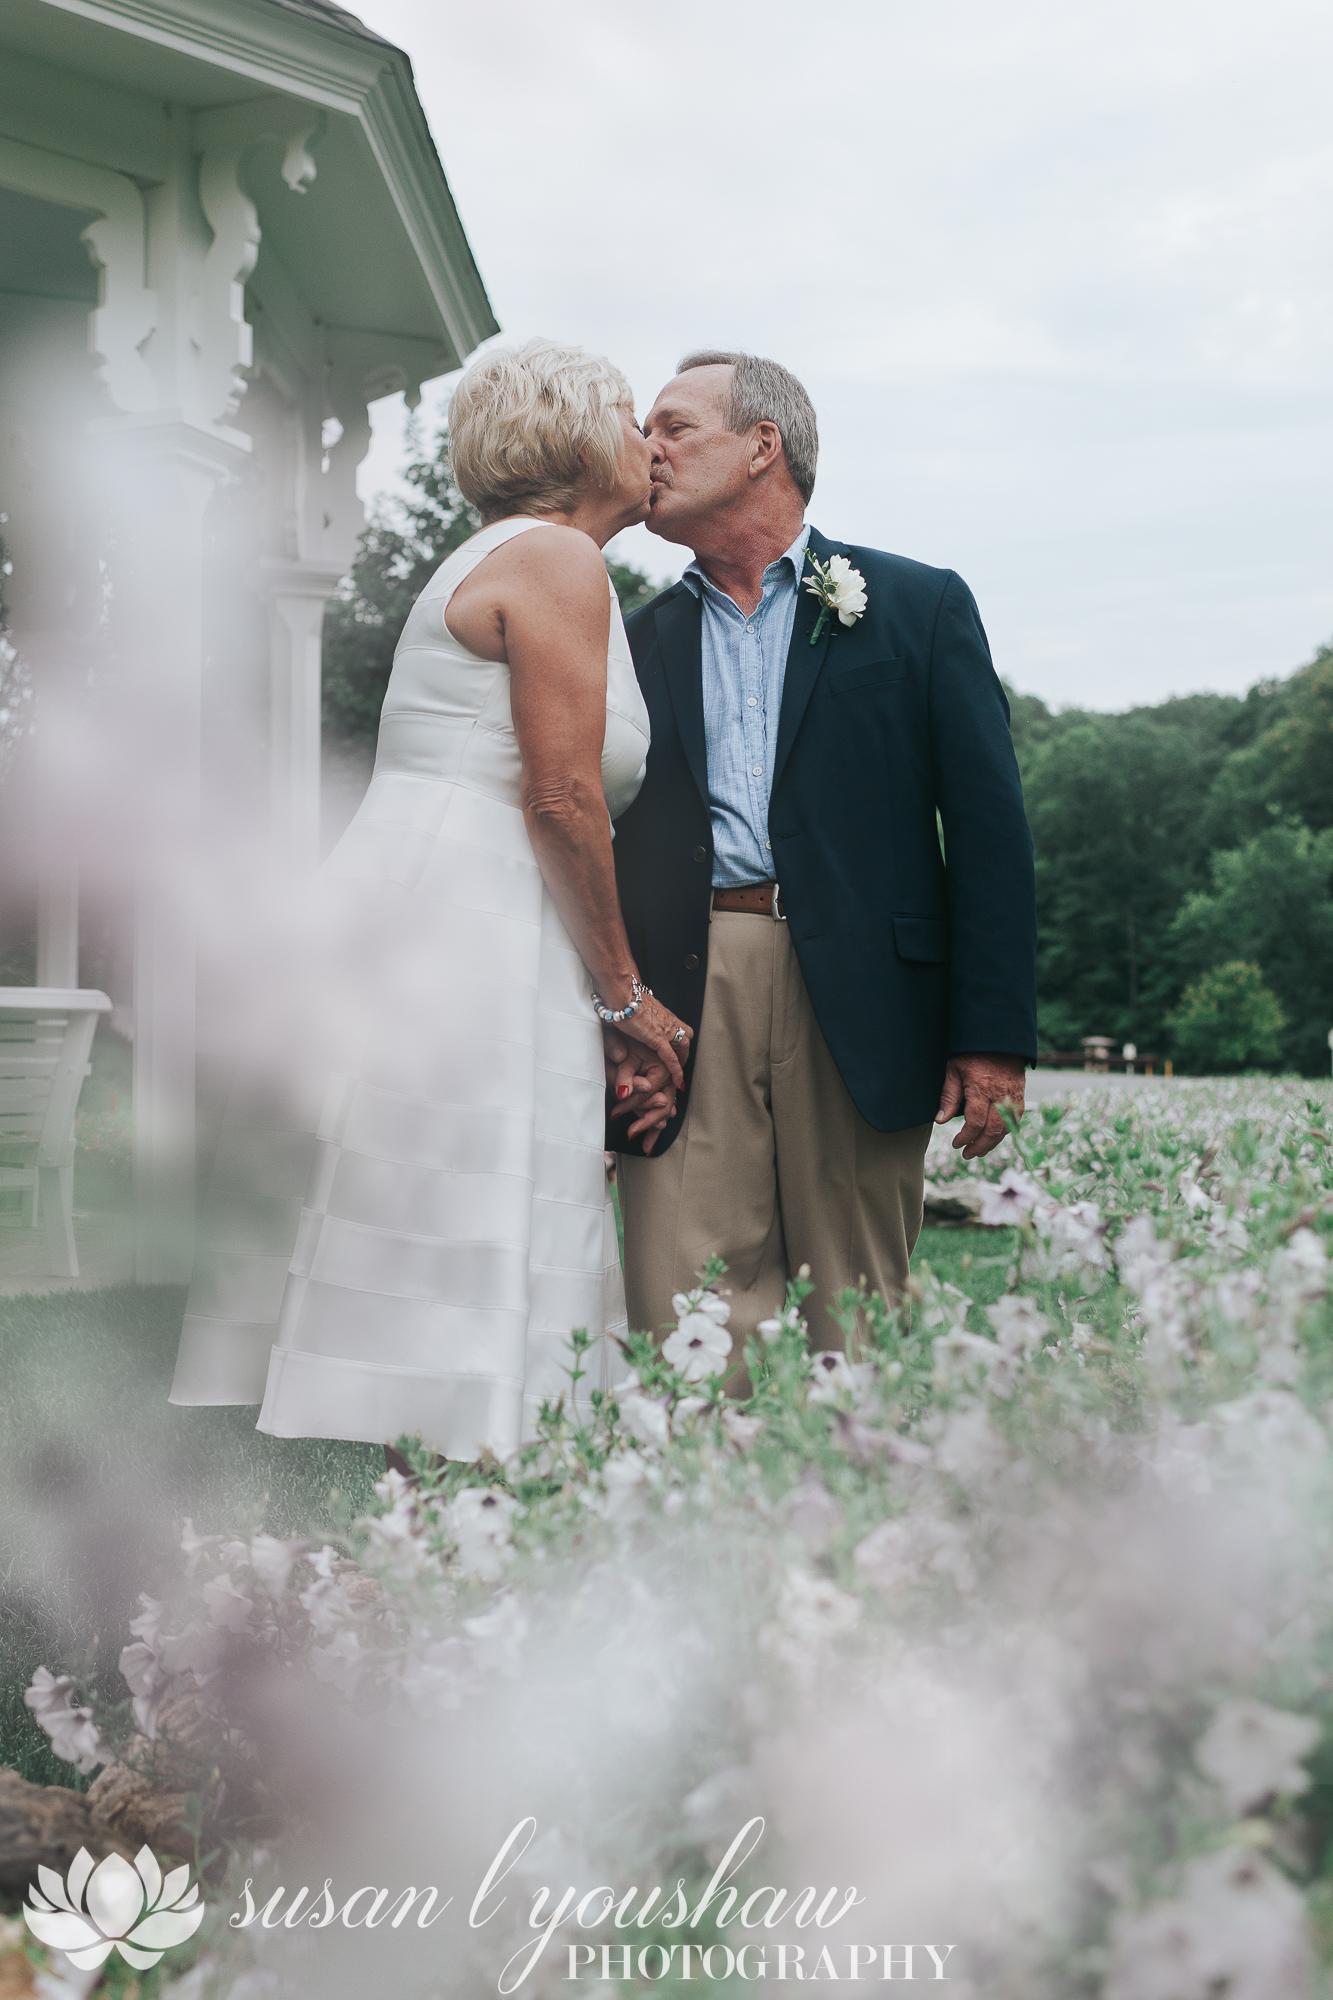 BLOG Carolyn Adams and Jim McCune 07-04-2018 SLY Photography-127.jpg